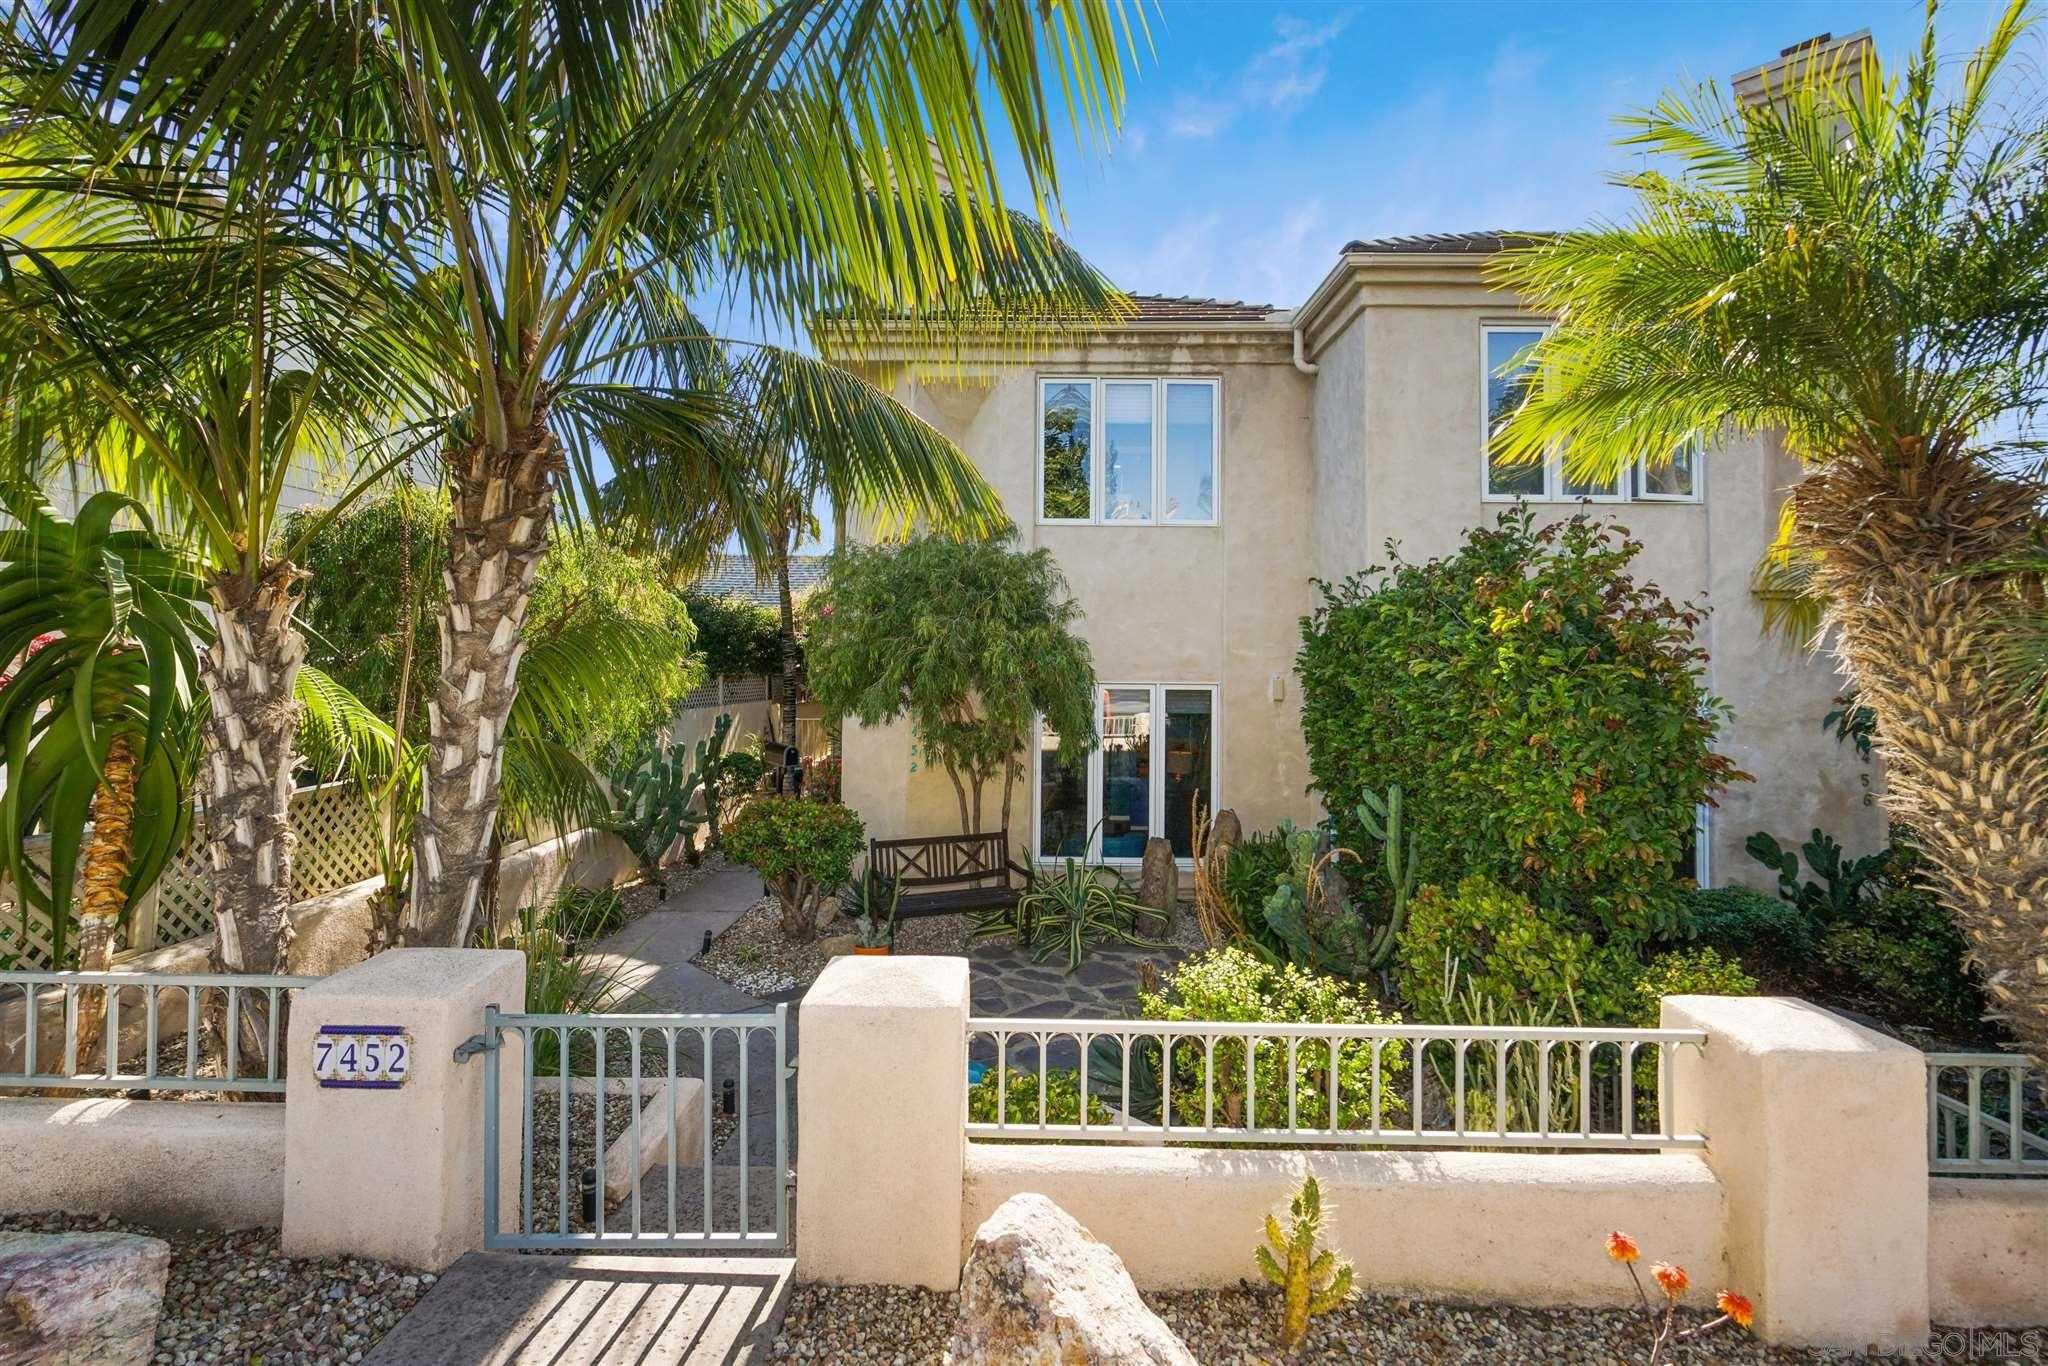 $2,100,000 - 3Br/4Ba -  for Sale in The Beach Barber Tract, La Jolla